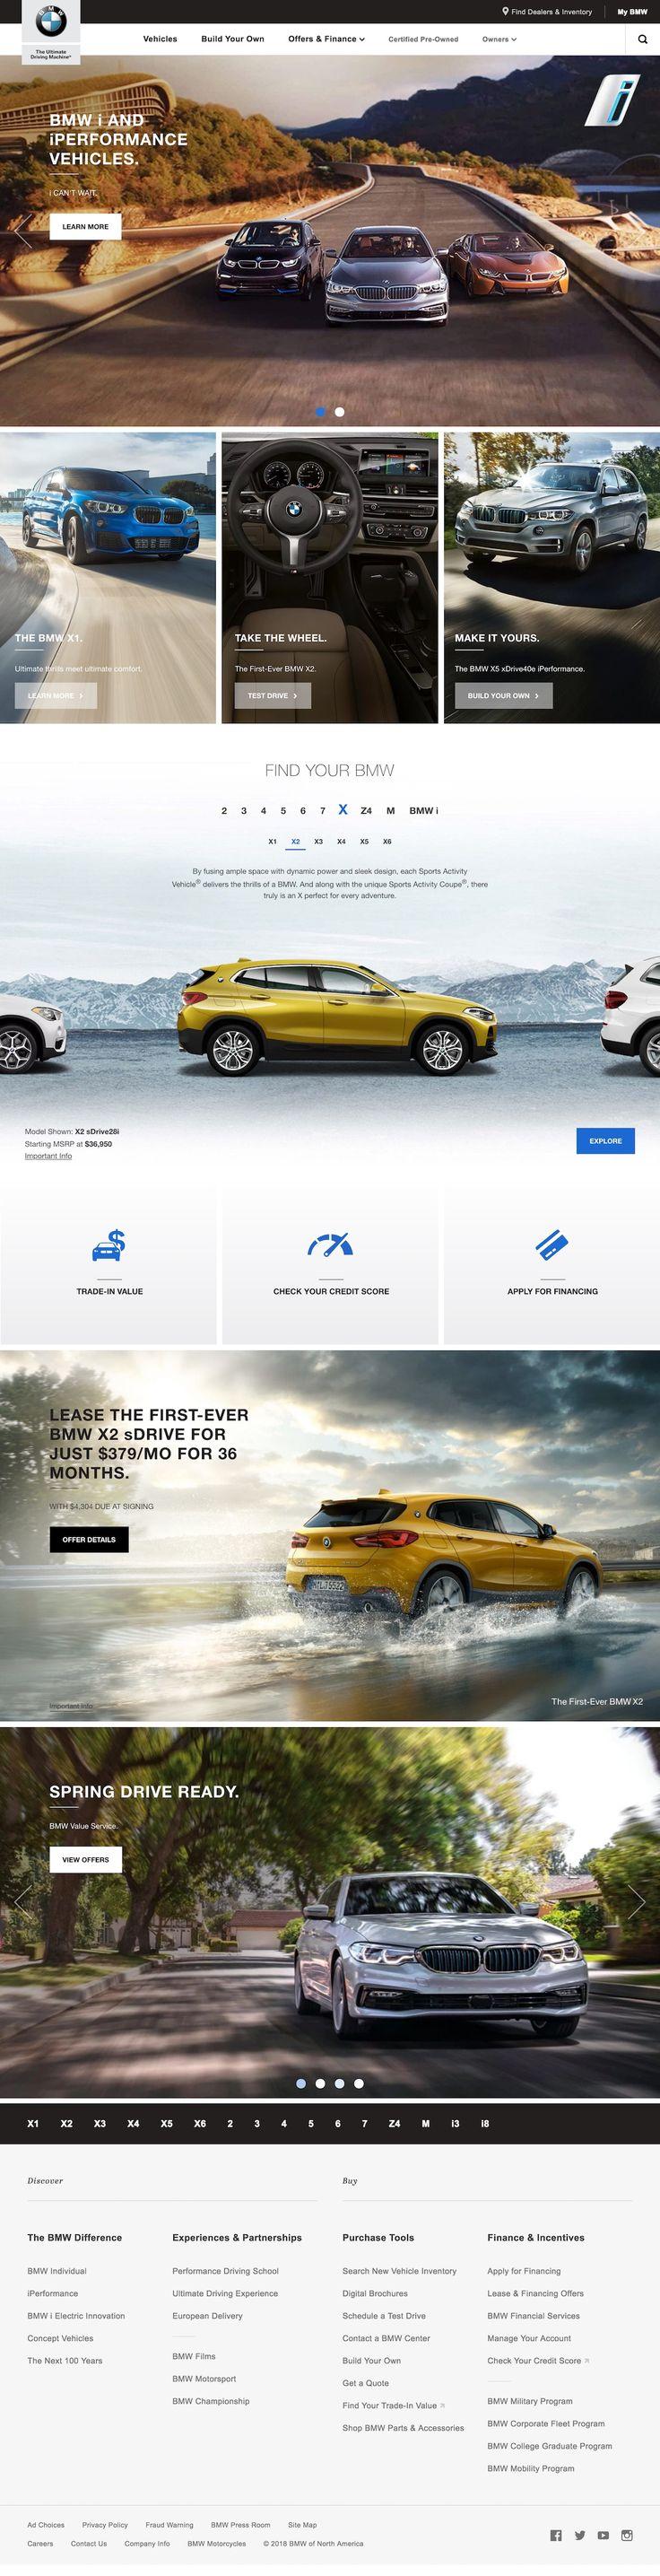 BMW clean web design to complement slick automobiles